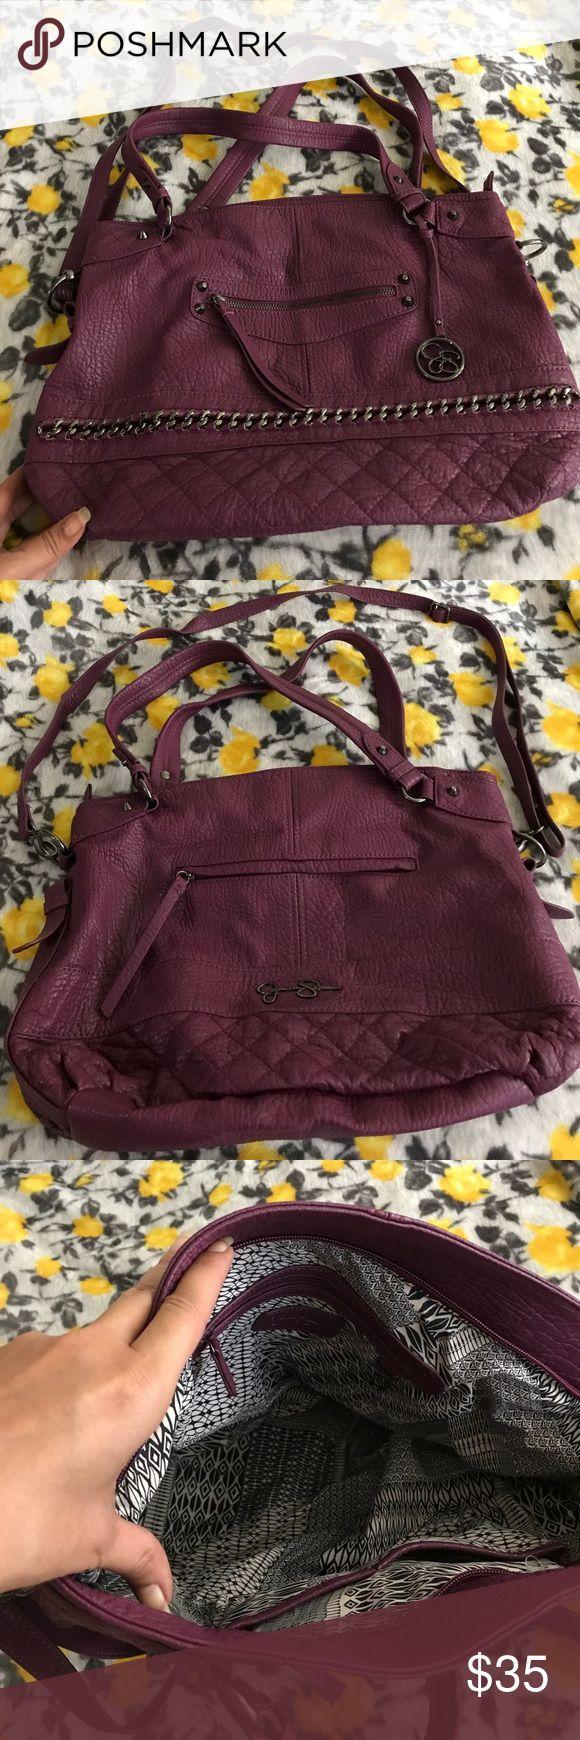 Used Jessica Simpson purse Super cute used Jessica Simpson purse in great condition Jessica Simpson Bags